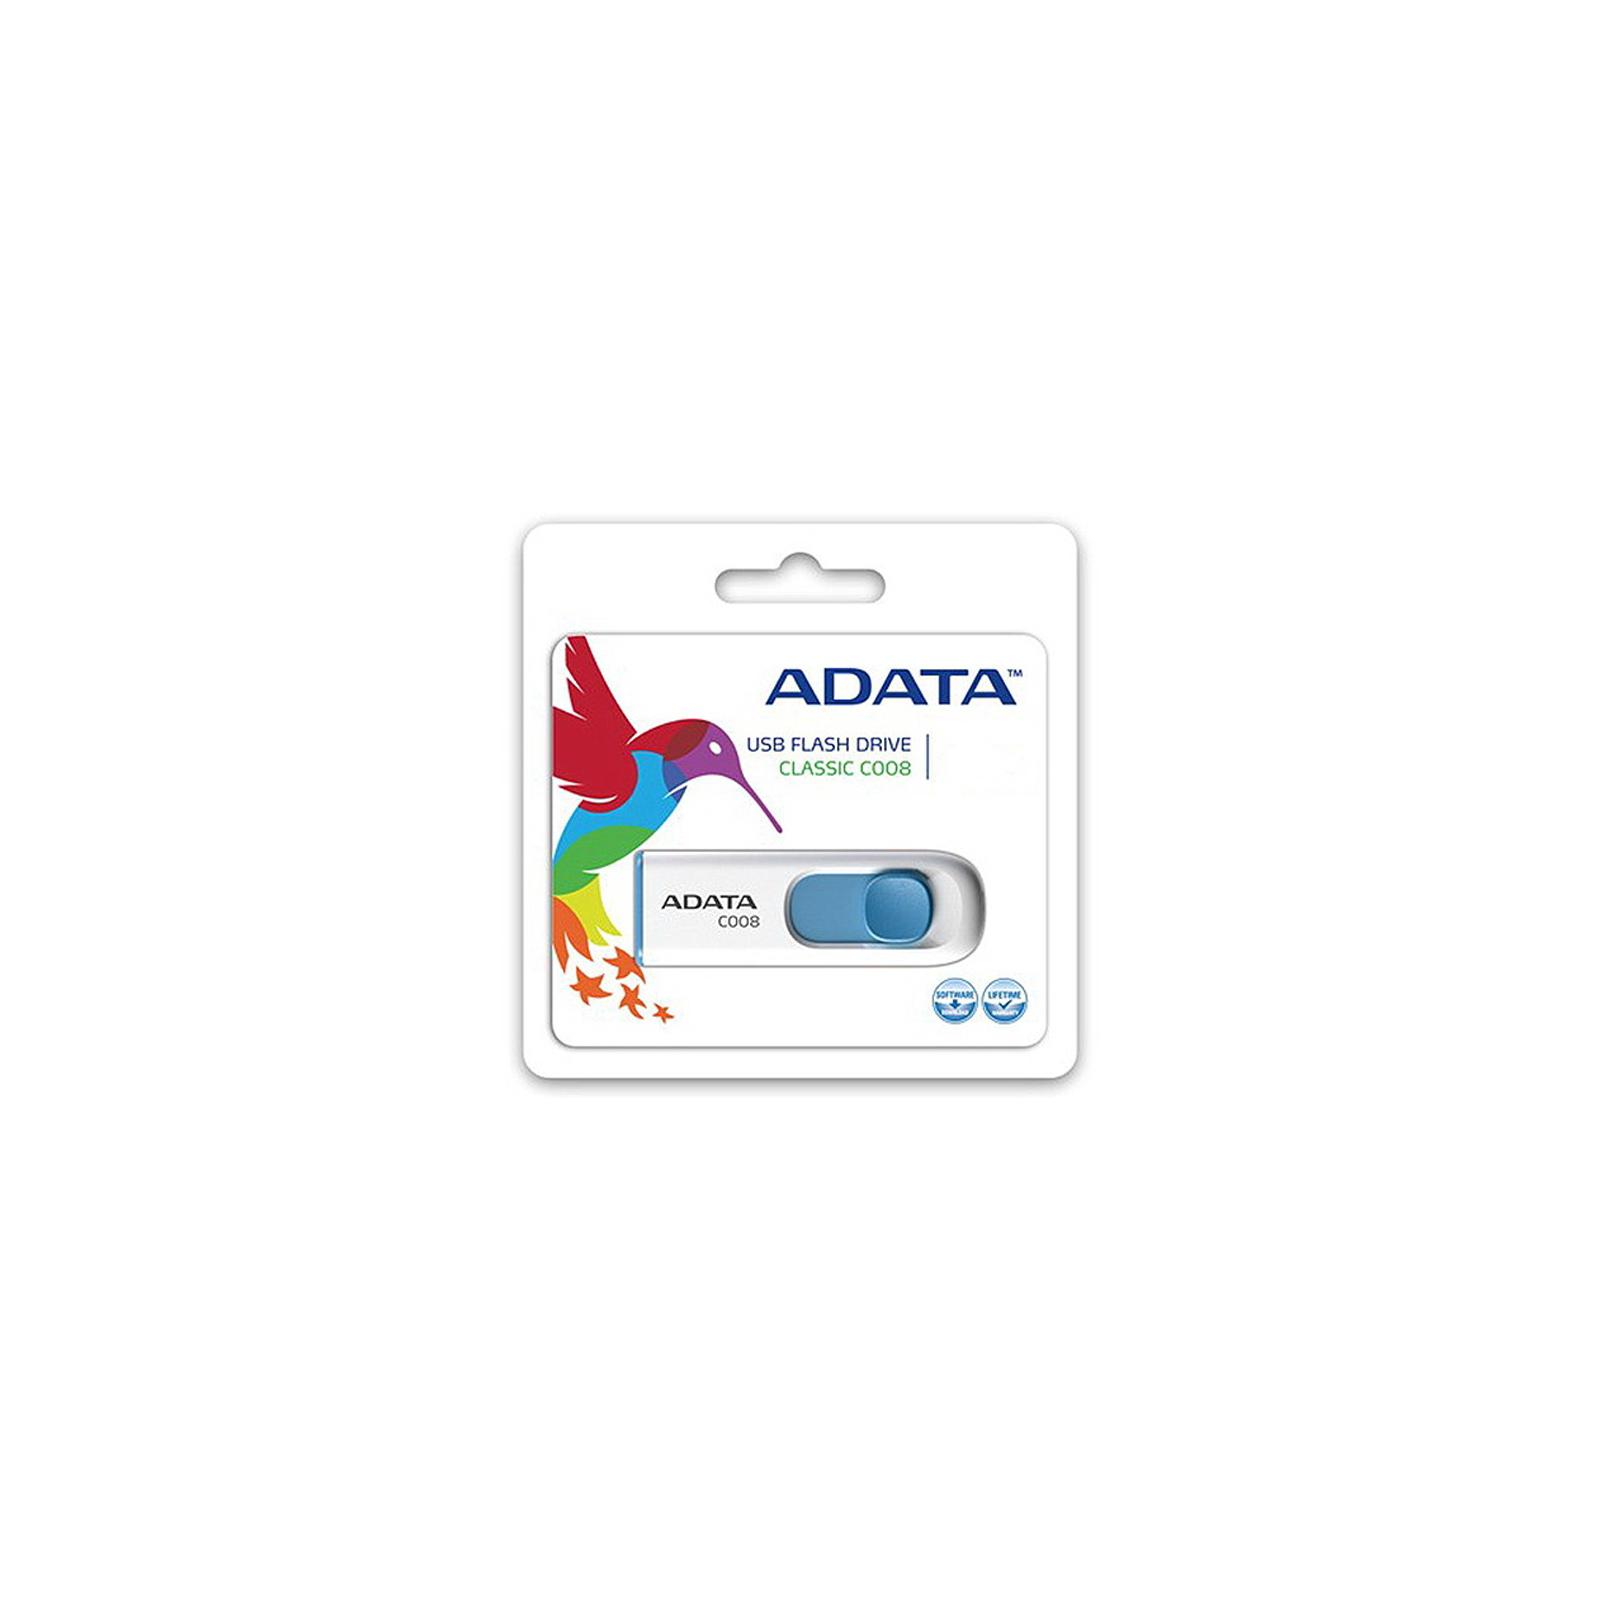 USB флеш накопитель ADATA 32Gb C008 black+red (AC008-32G-RKD) изображение 5